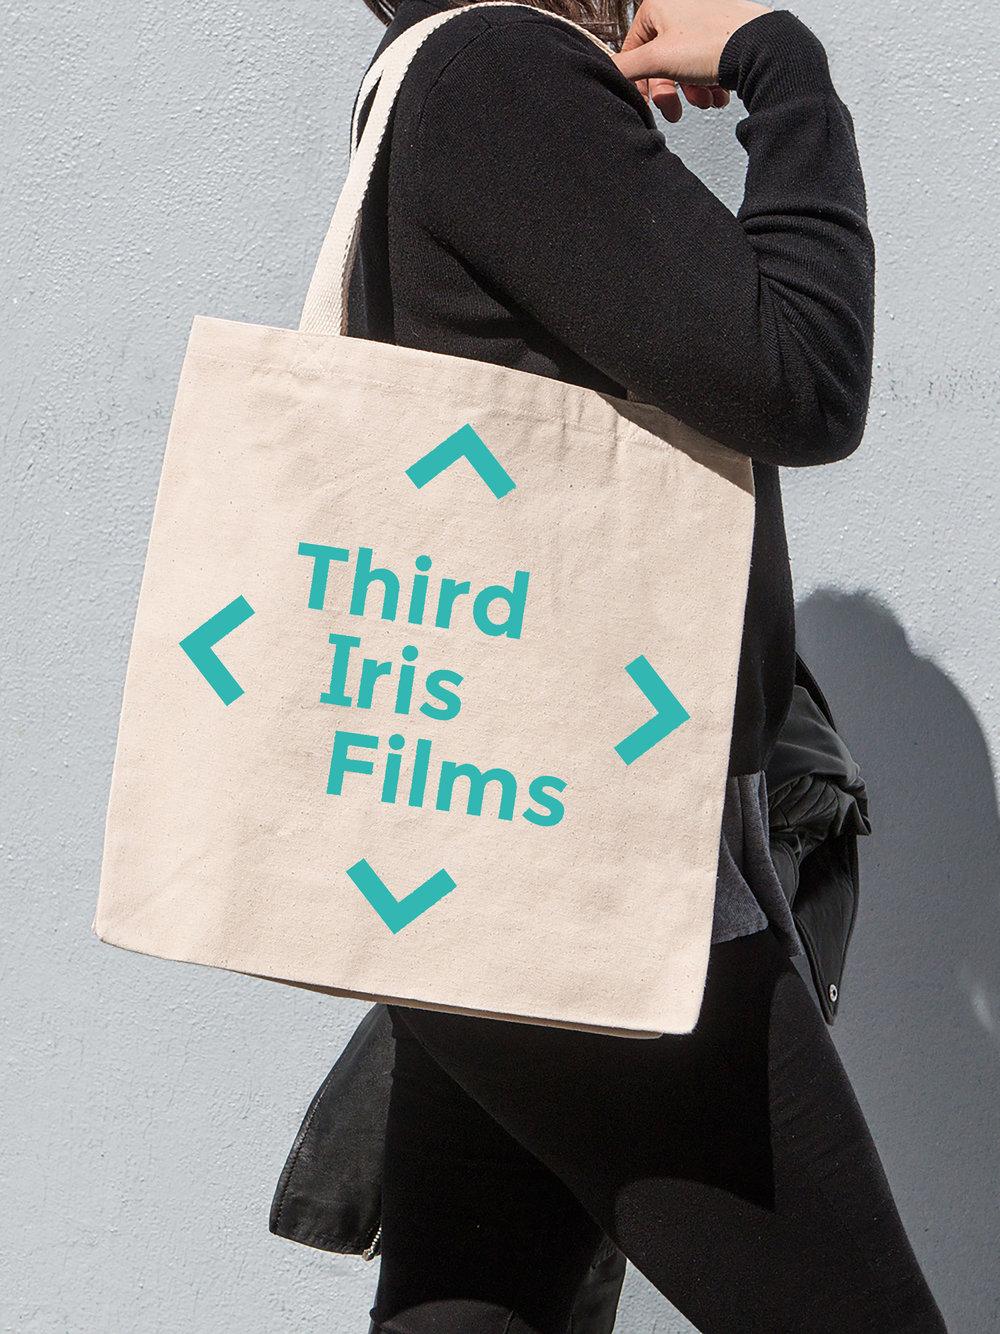 Third iris Films bag design copy.jpg